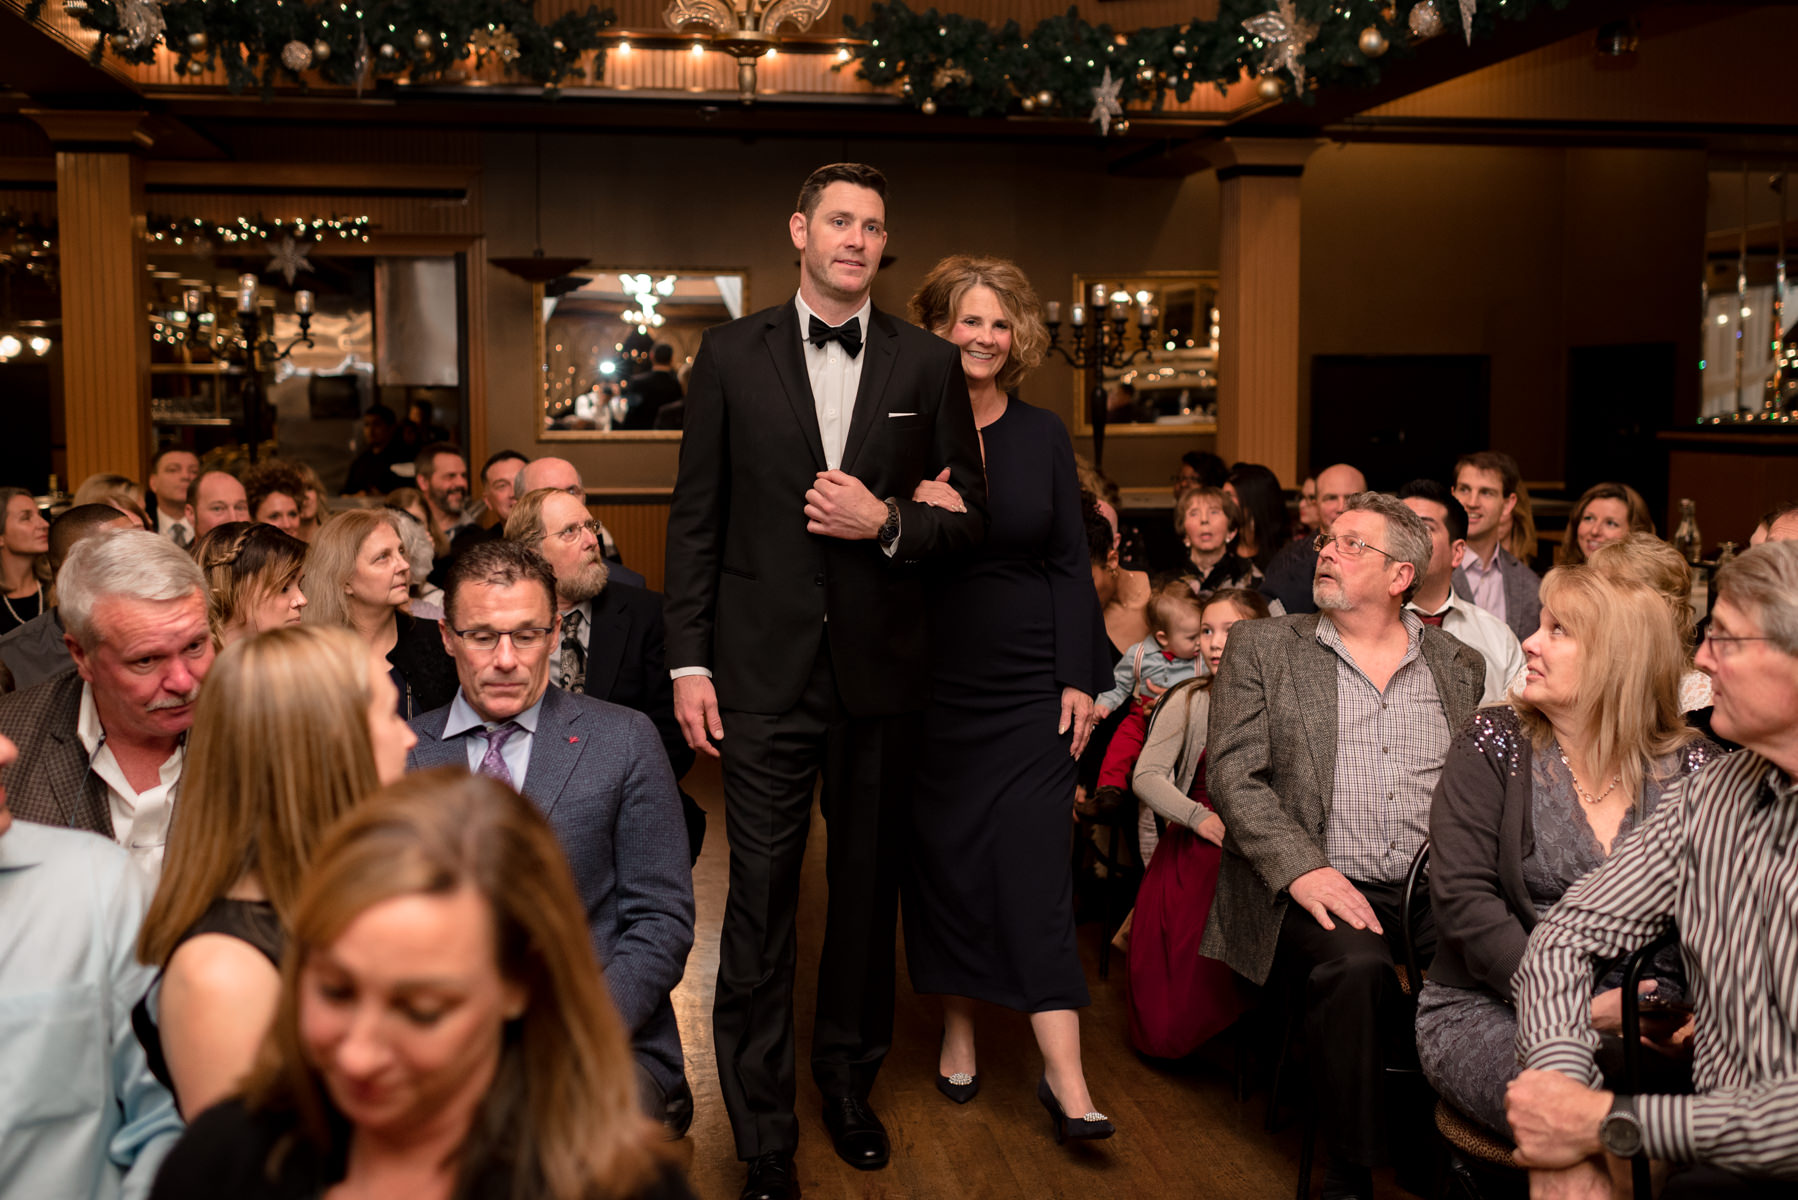 Andrew Tat - Documentary Wedding Photography - Lake Union Cafe - Seattle, Washington -Rachel and Ryan - 05.jpg